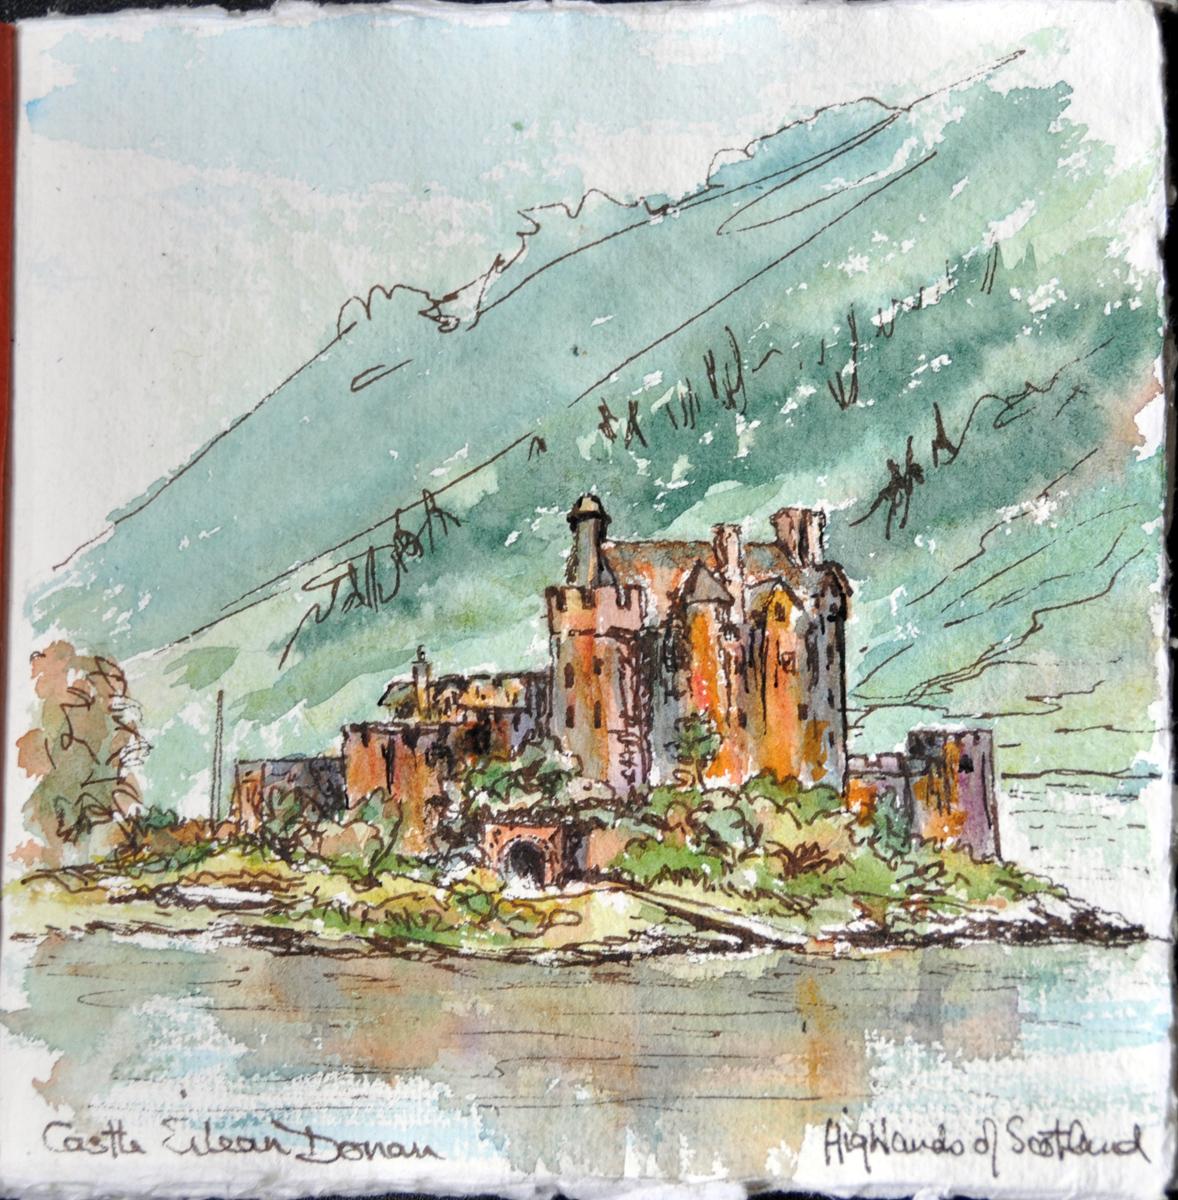 http://3.bp.blogspot.com/-Aw1GPJl_cn0/TjvSLiQyBPI/AAAAAAAAAIM/n7xmIb6Bsdw/s1600/Castle+Eilean+Donan+1.jpg